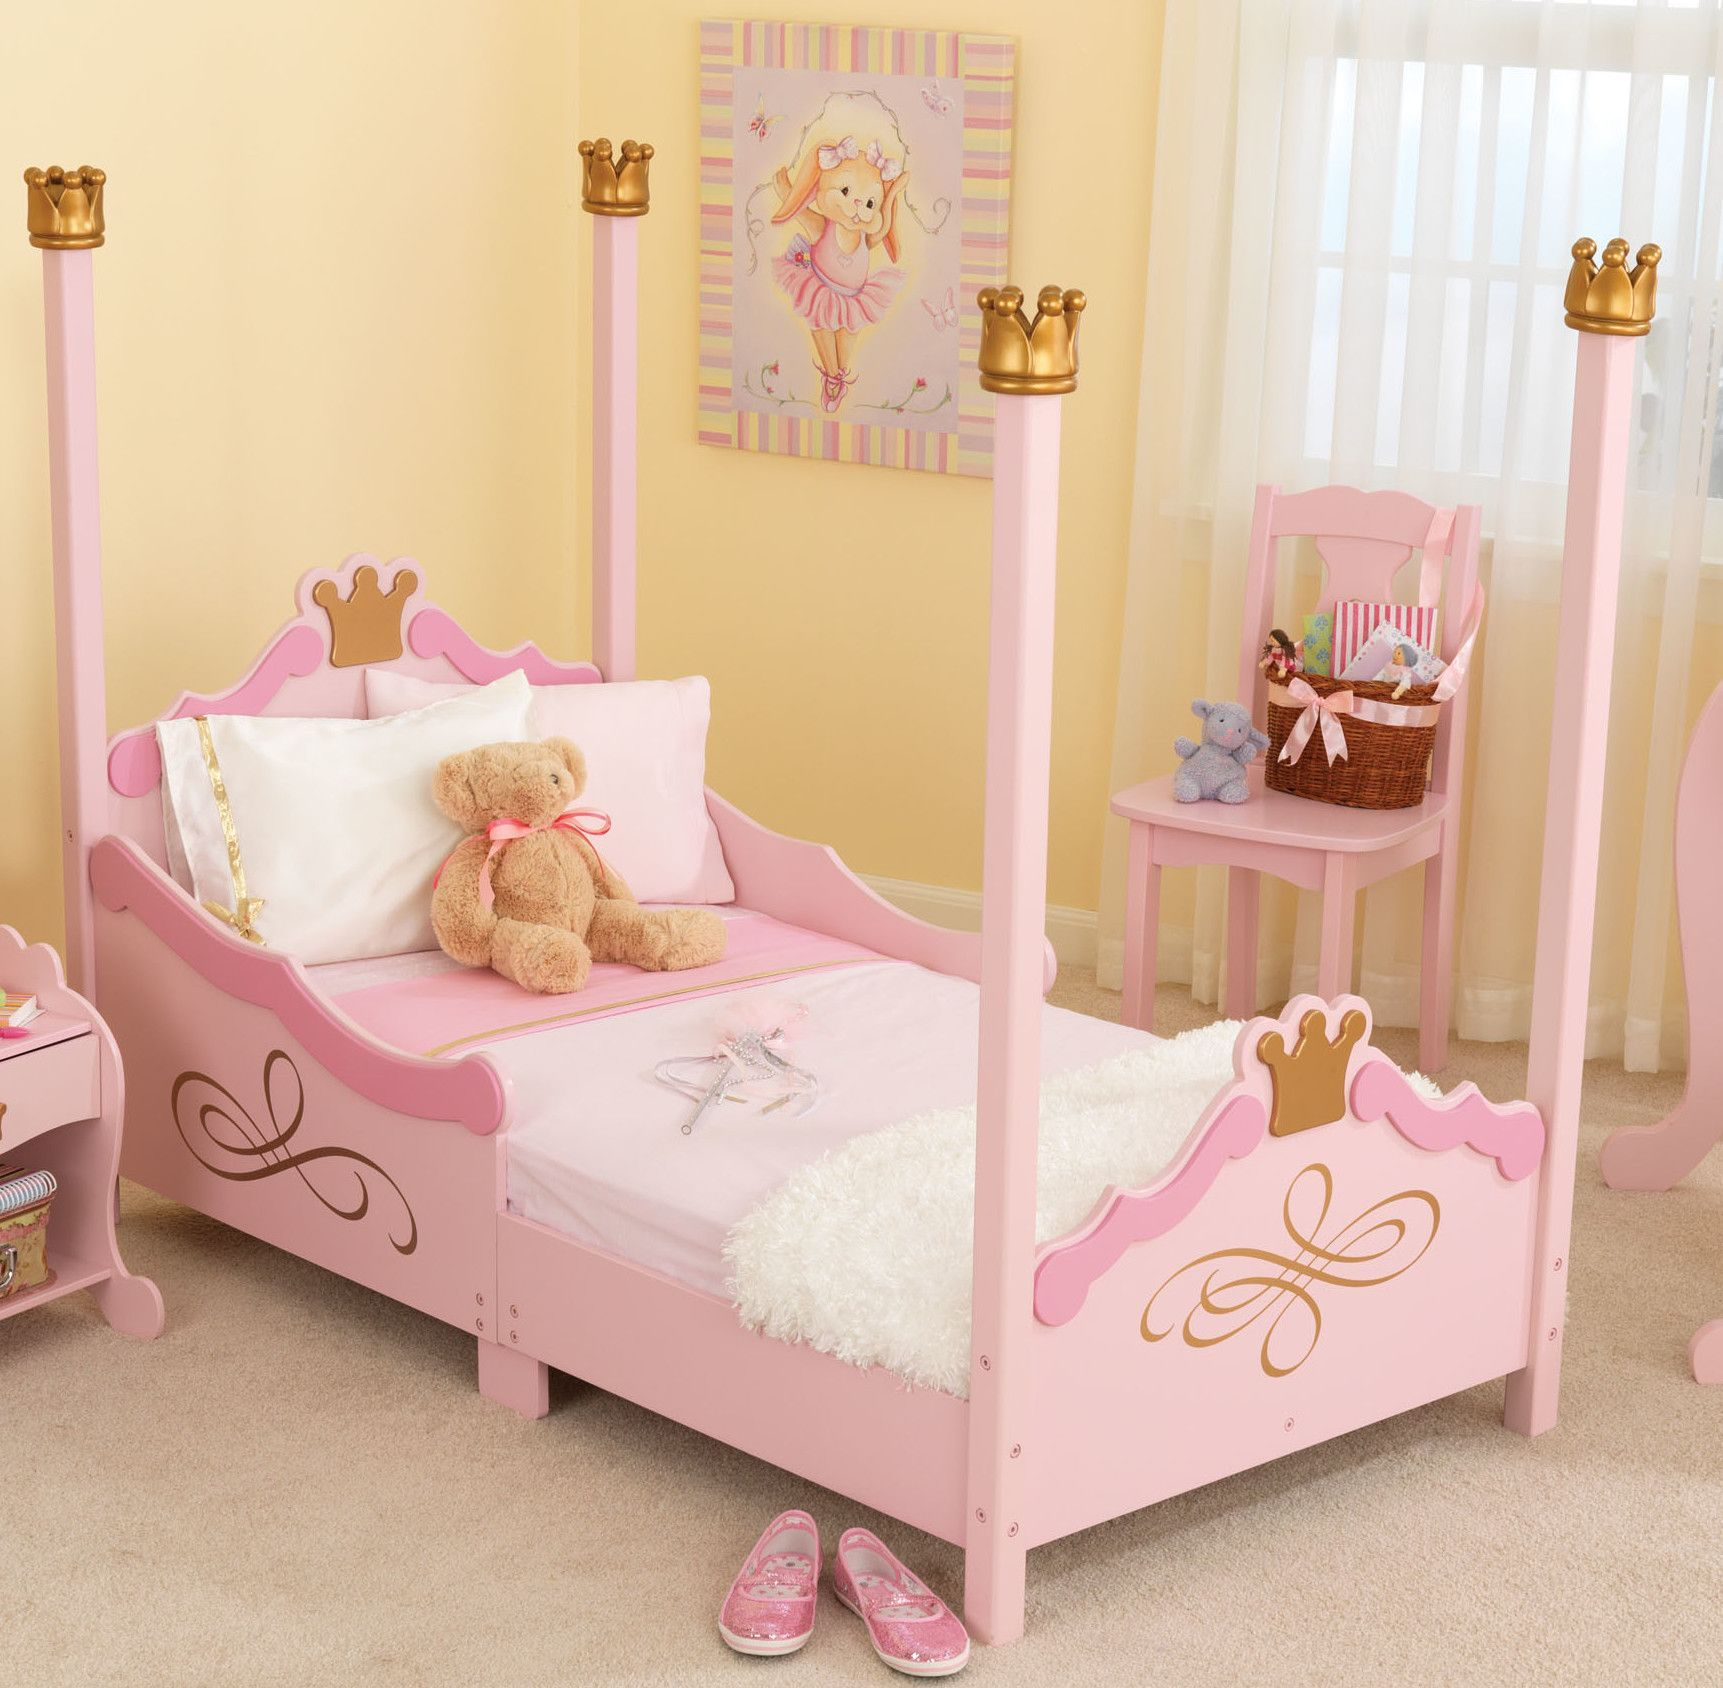 Princess Toddler Four Poster Bed Princess Toddler Bed Toddler